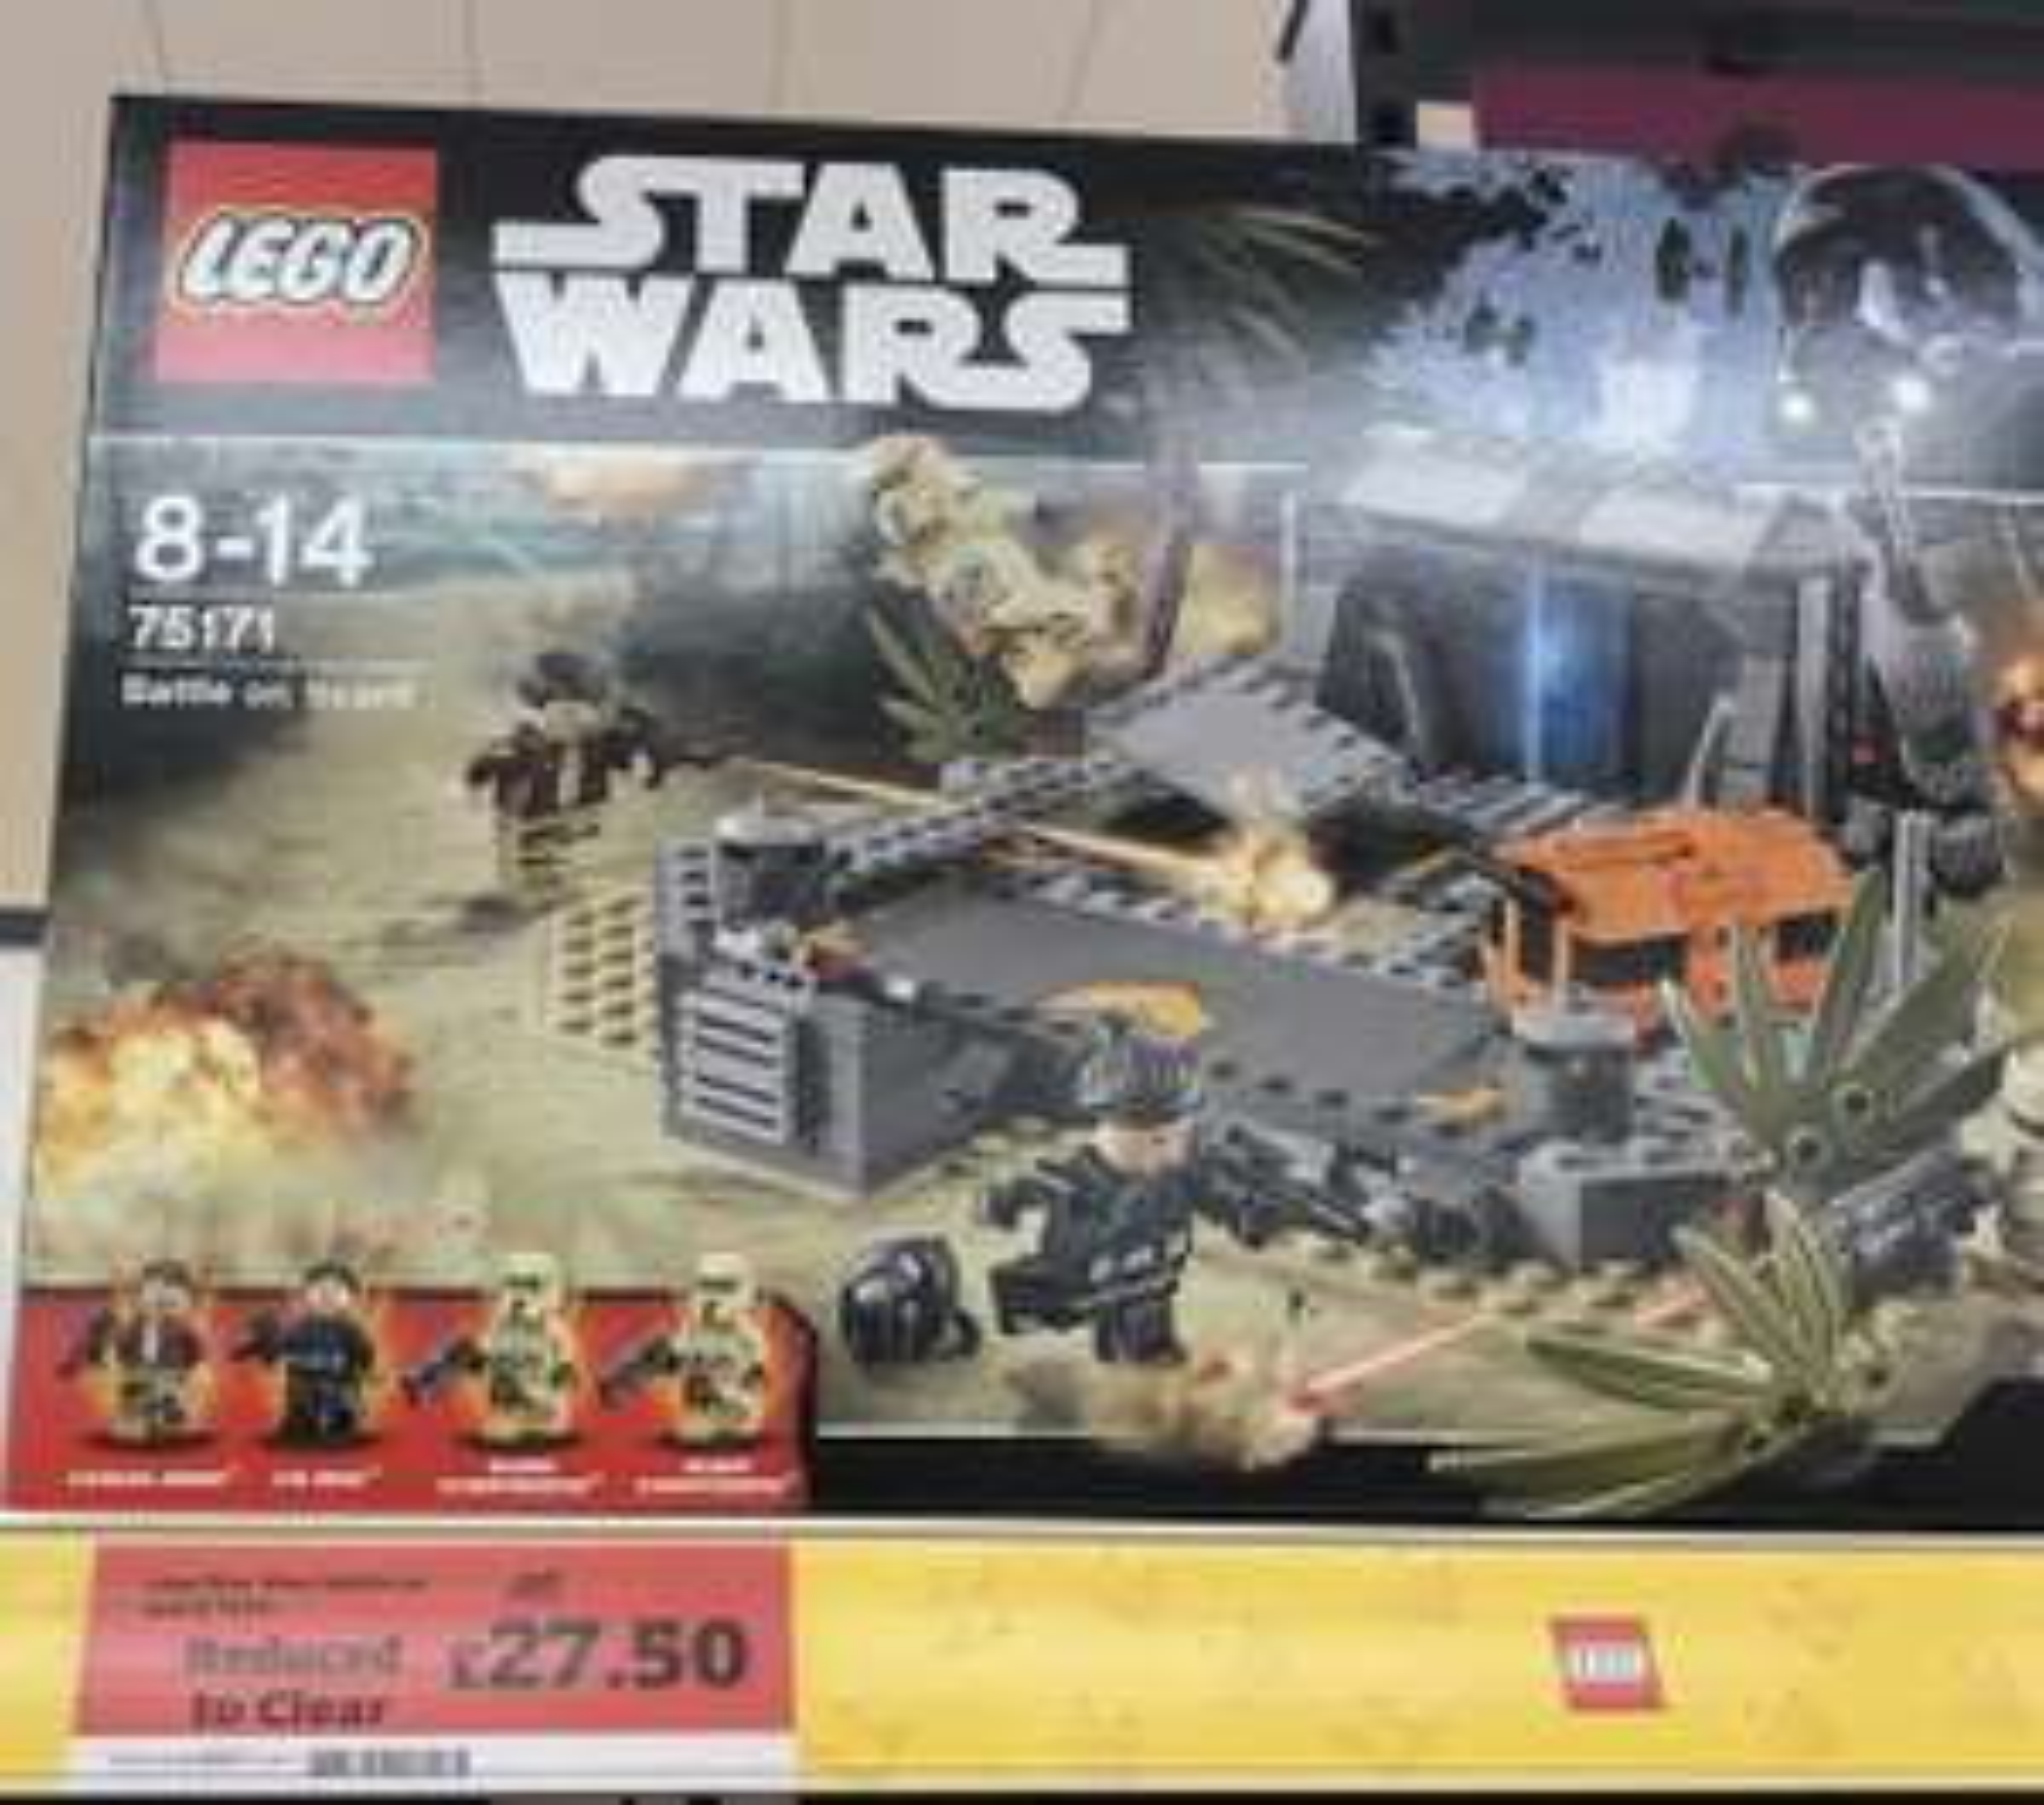 Lego Star Wars: Battle on Scarif 75171 £27.50 at Sainsburys